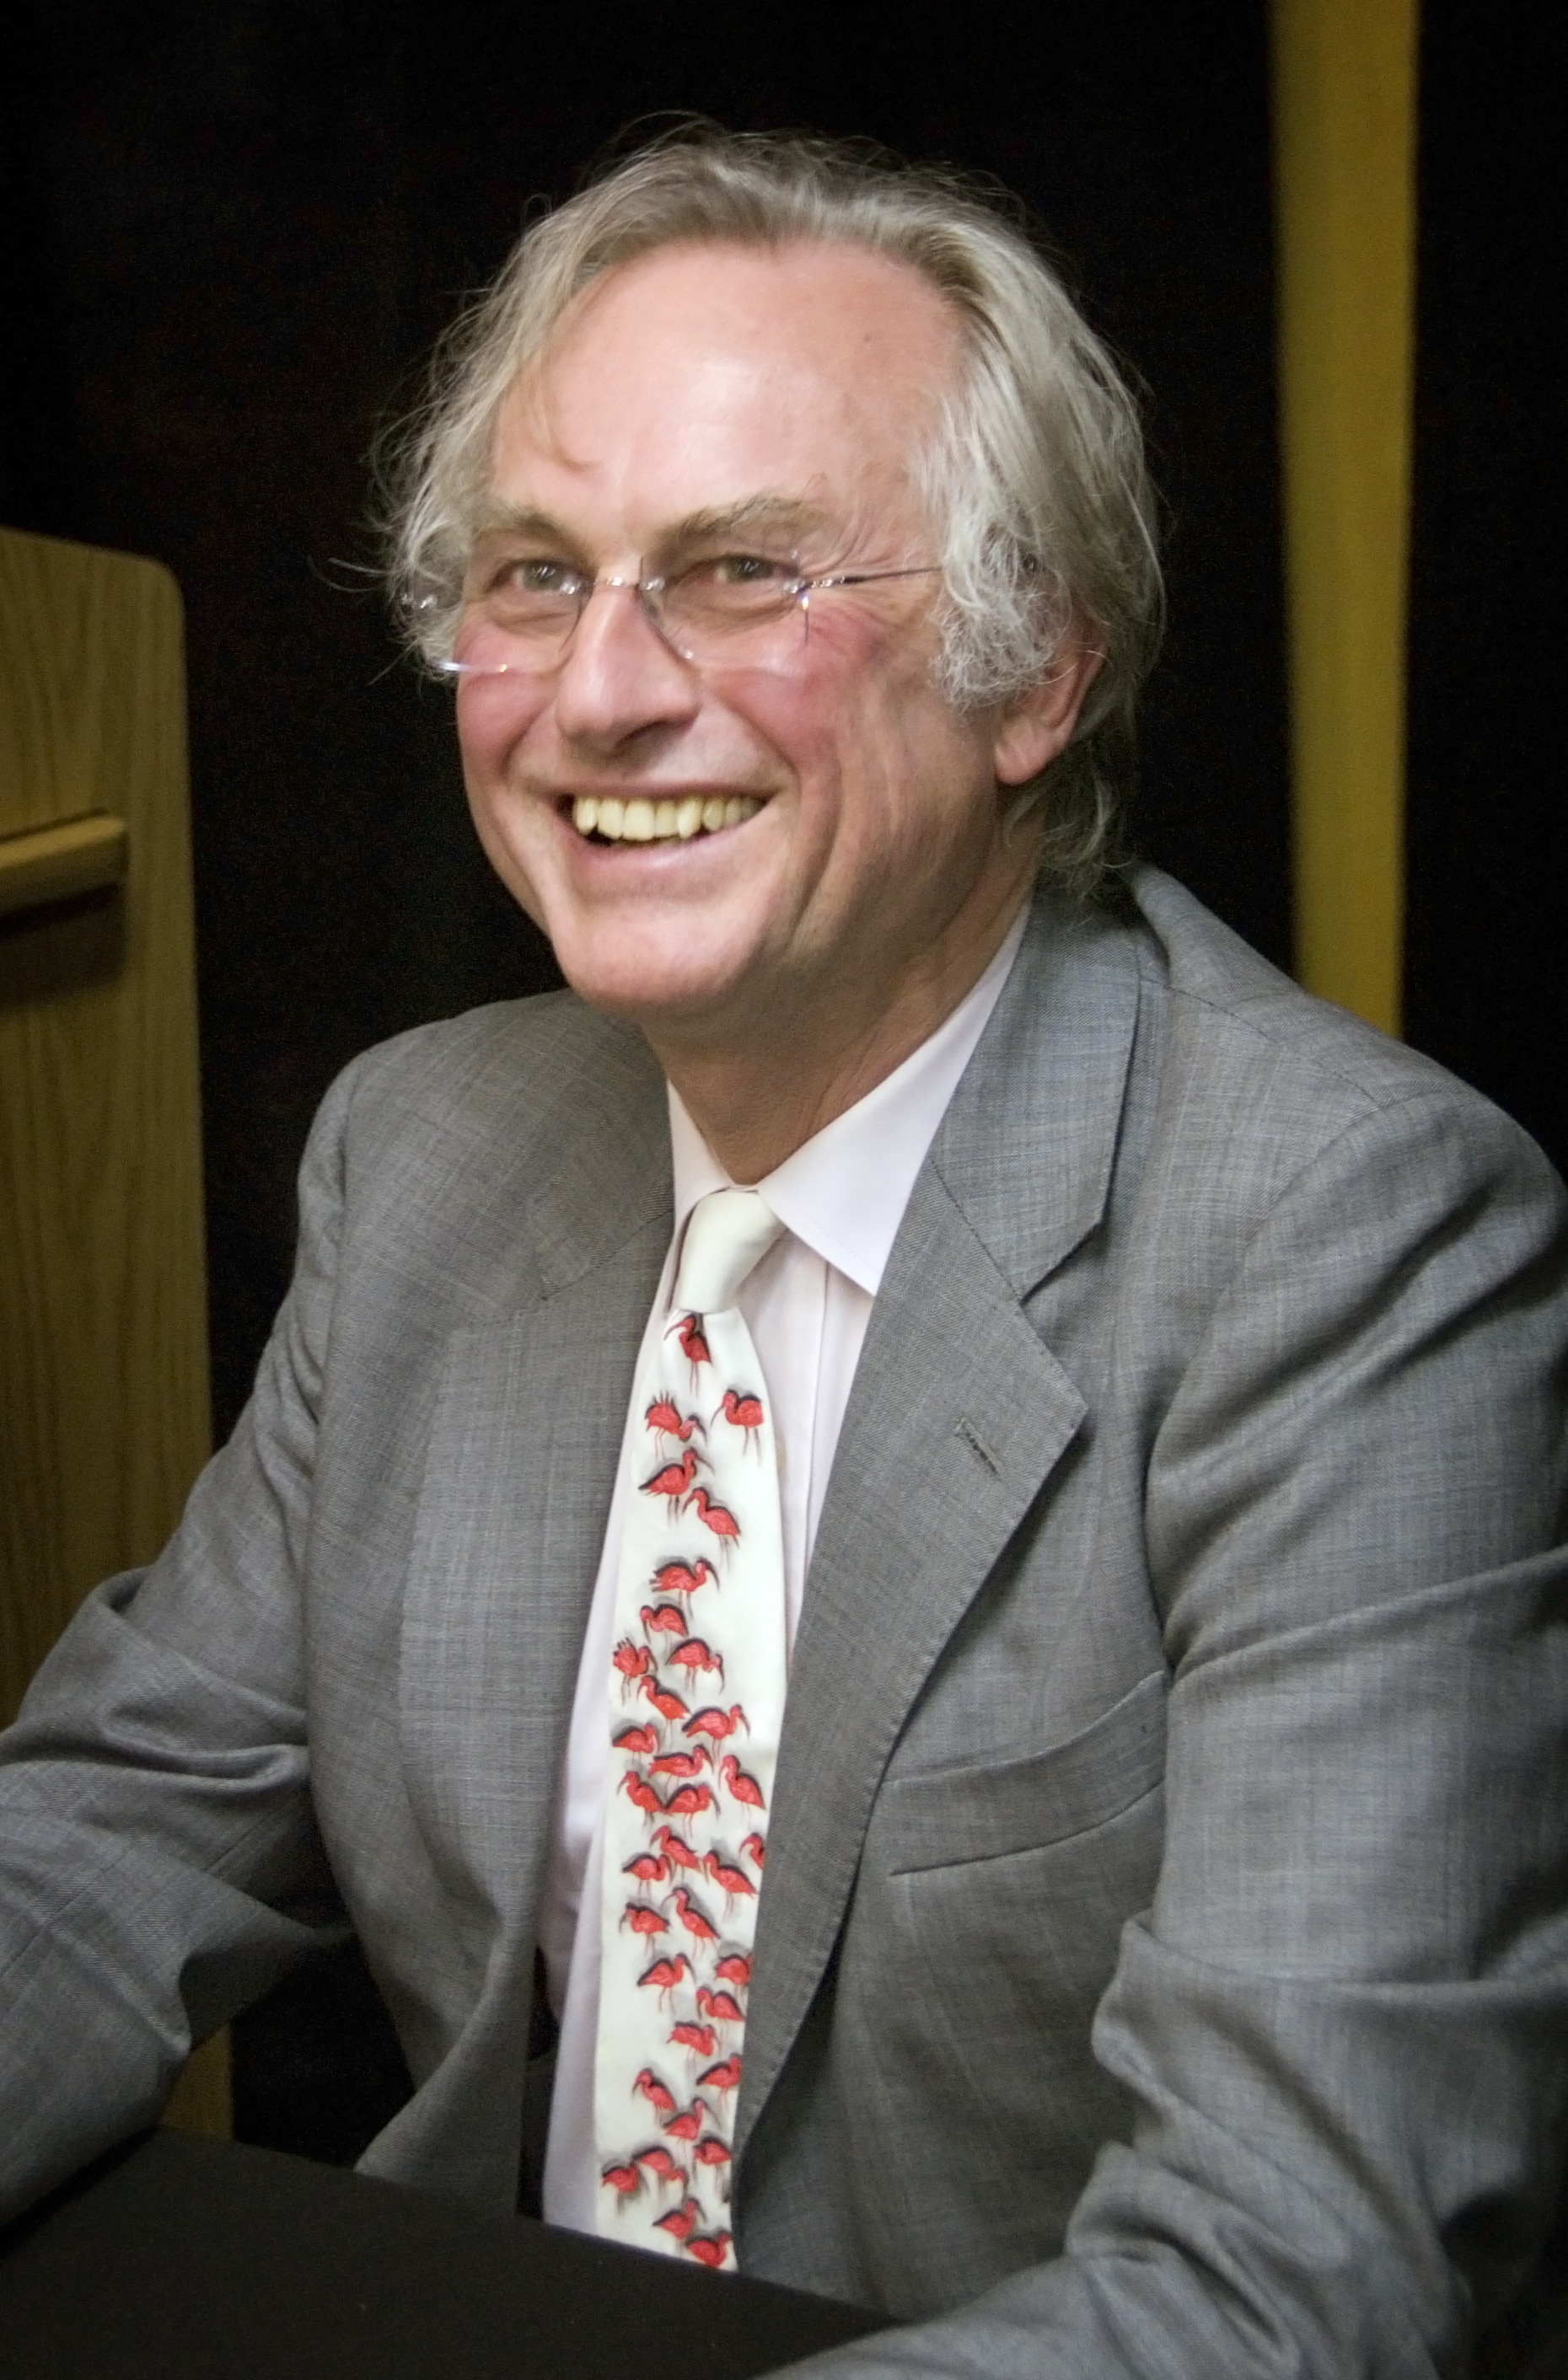 filerichard dawkins 2009jpg wikimedia commons